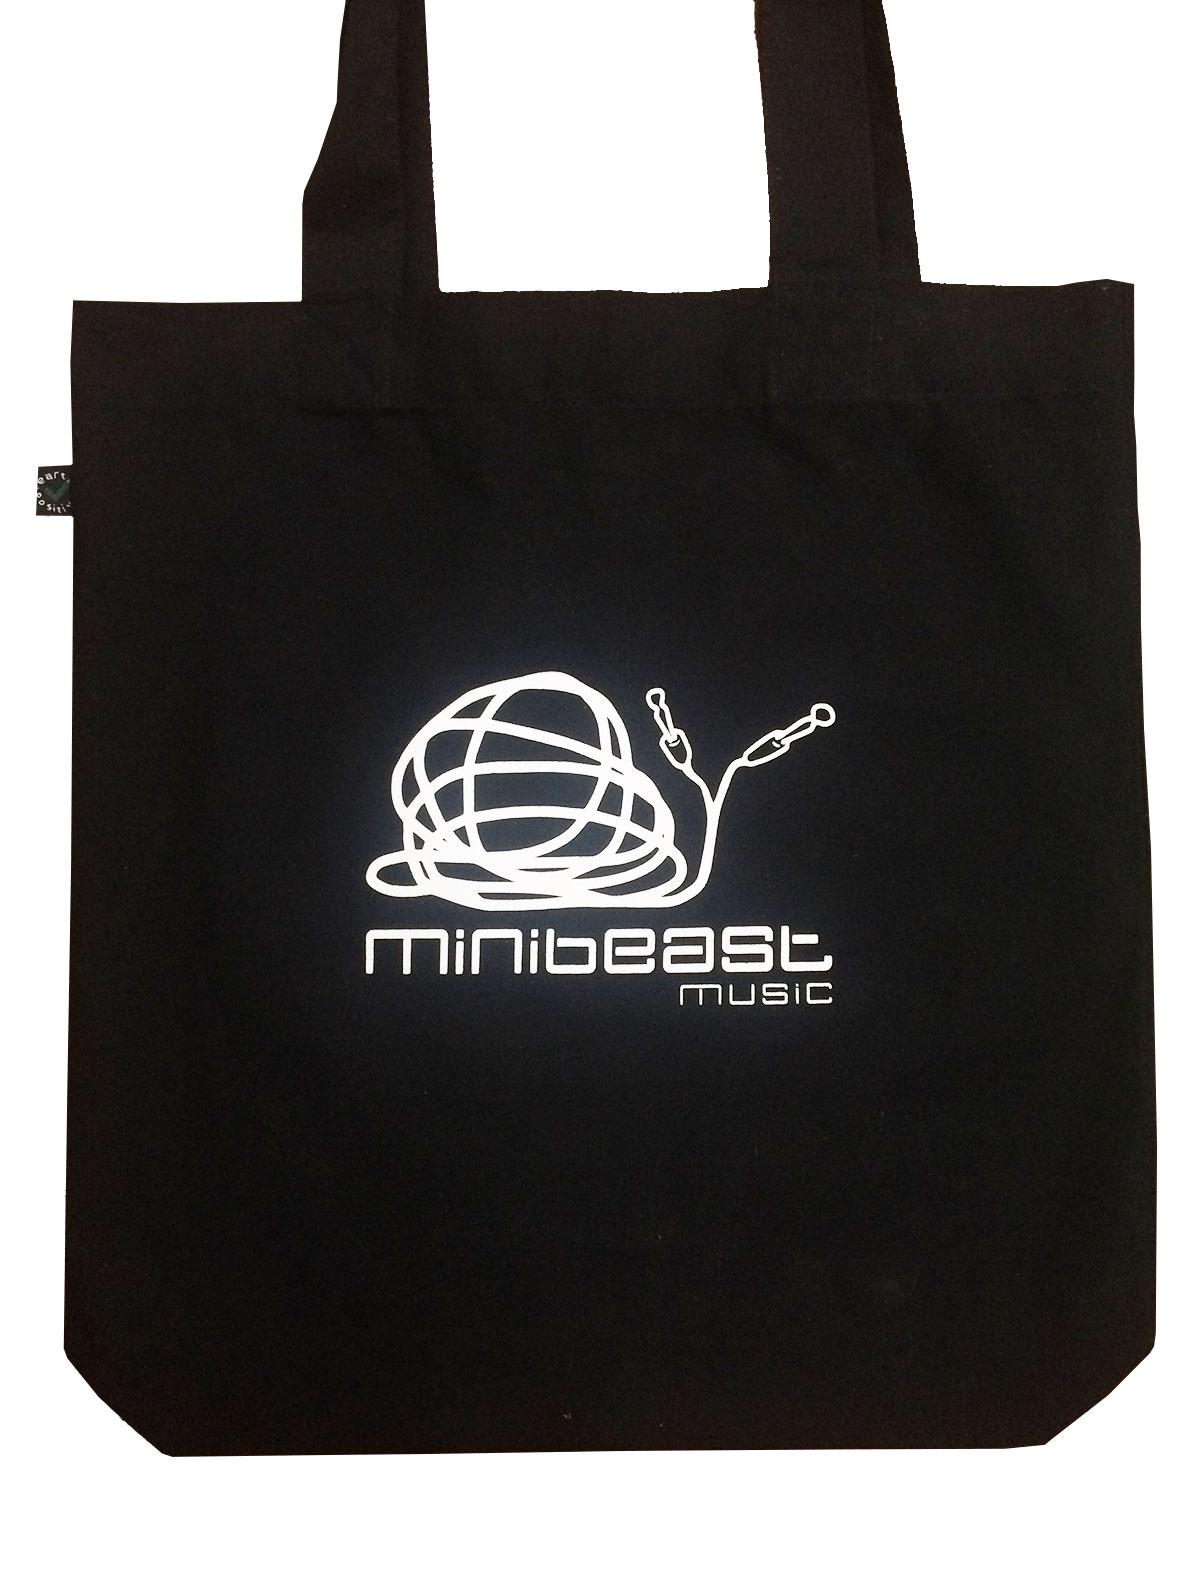 minibeast music studio, organic black tote bag